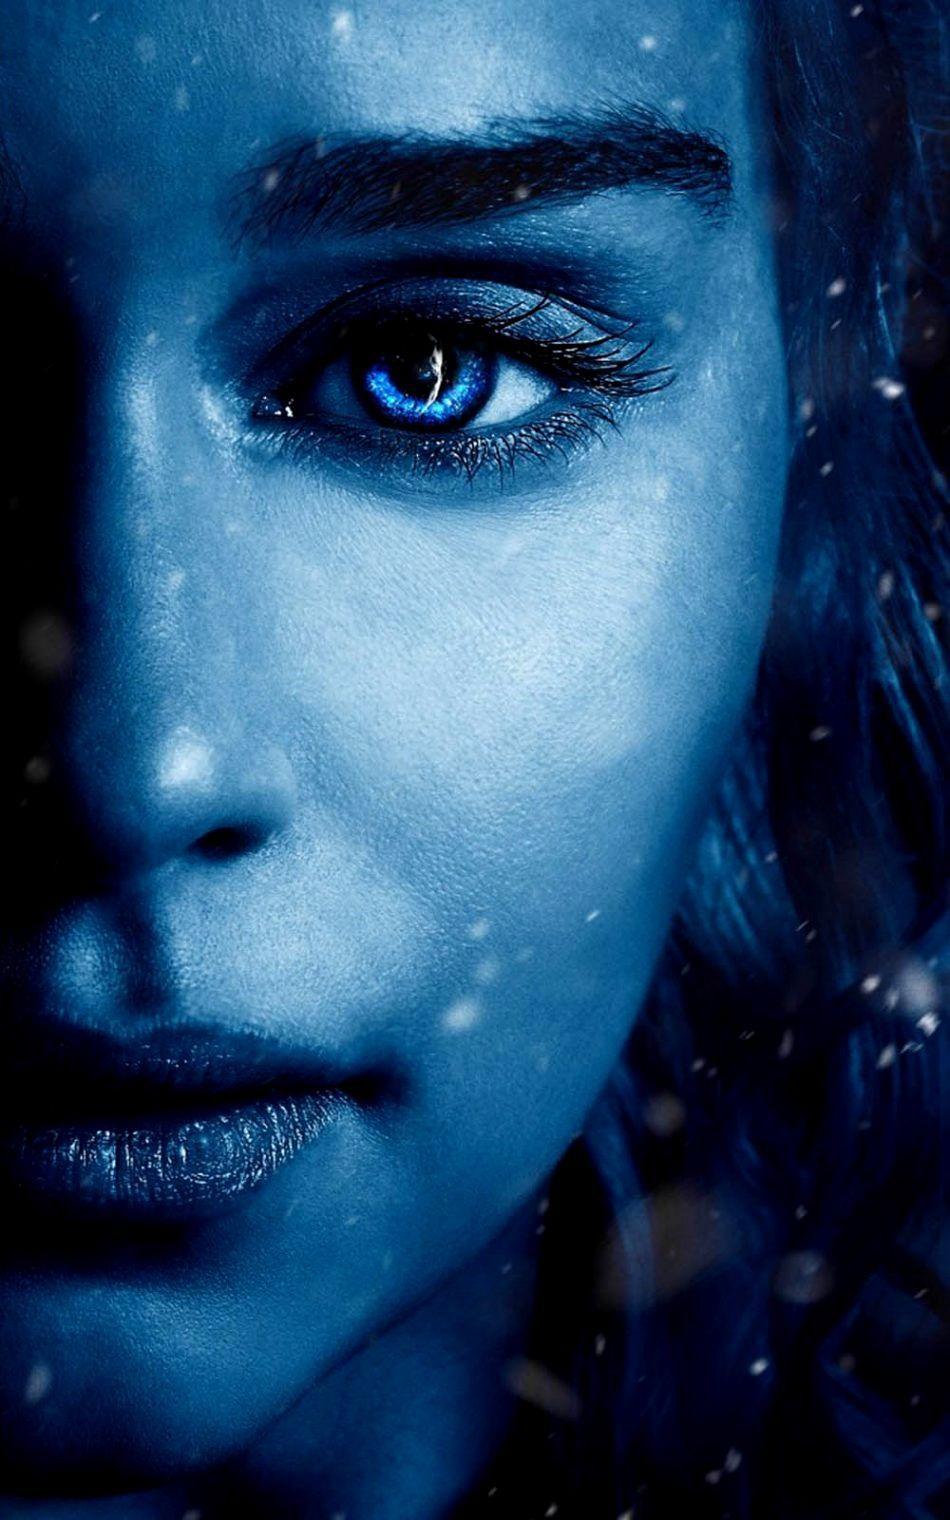 Game Of Thrones Wallpaper 4k Mobile Trick 4k In 2020 Game Of Thrones Poster Free Poster Printables Daenerys Targaryen Wallpaper